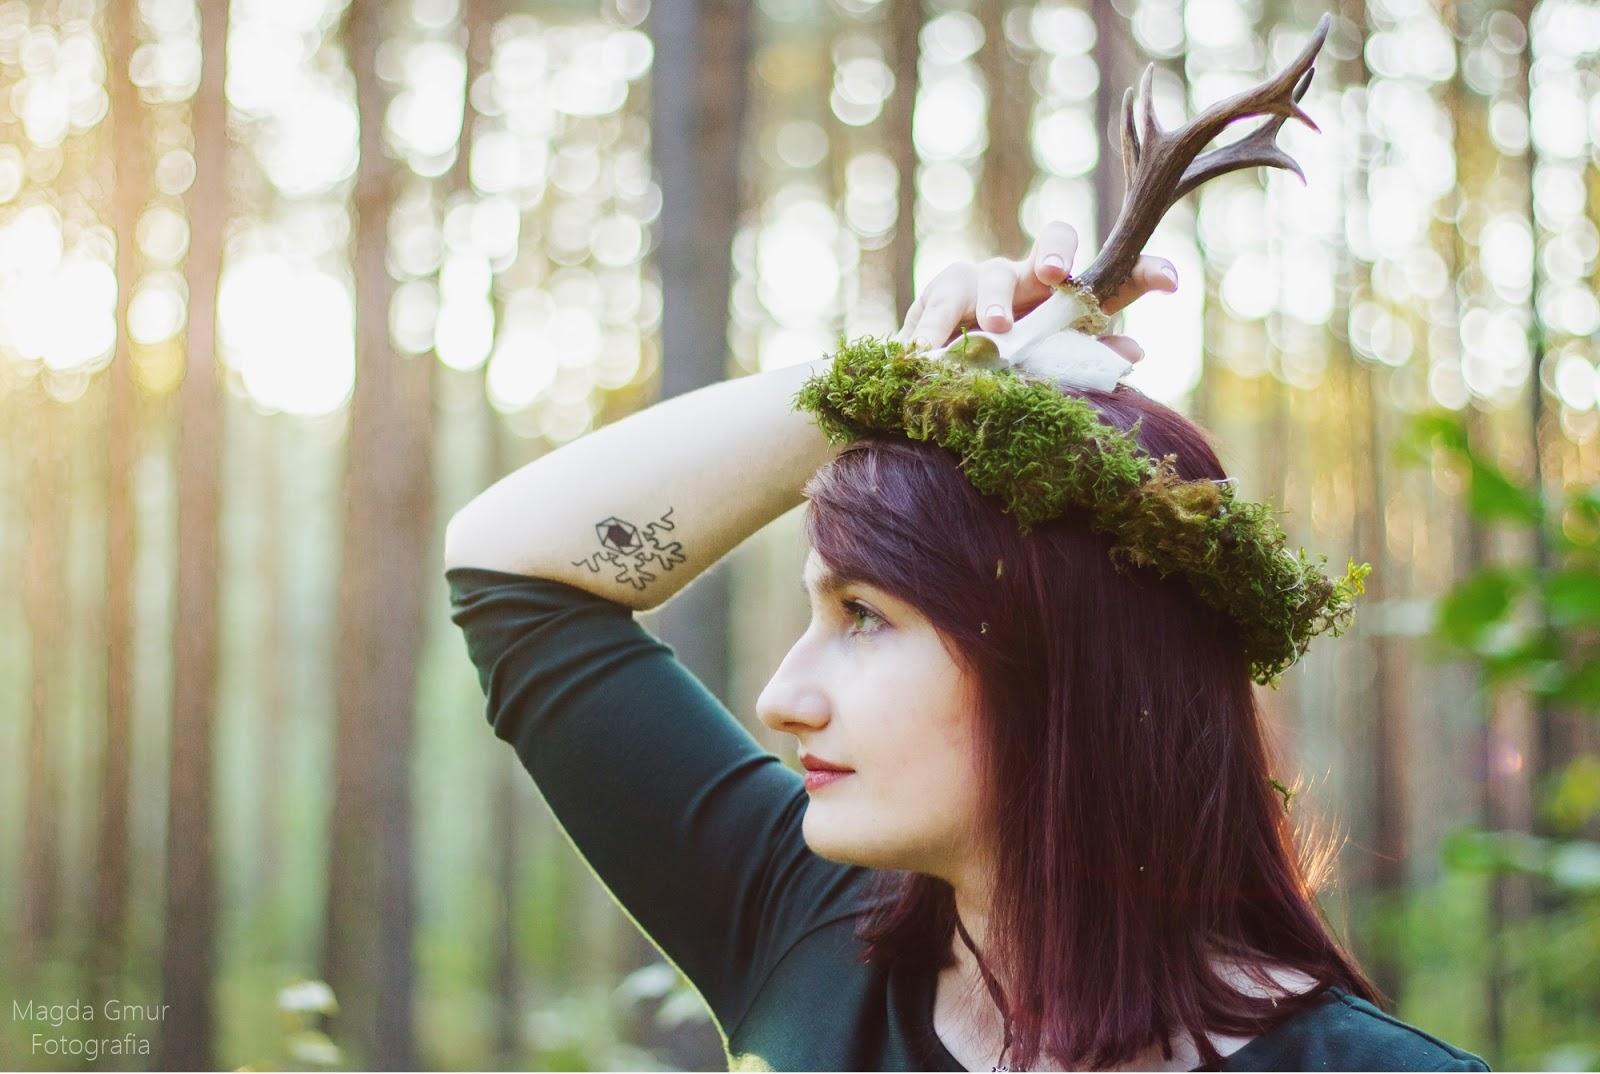 Sesja w lesie, zieleń, rogi jelenia sesja, rogi sesja, bokeh